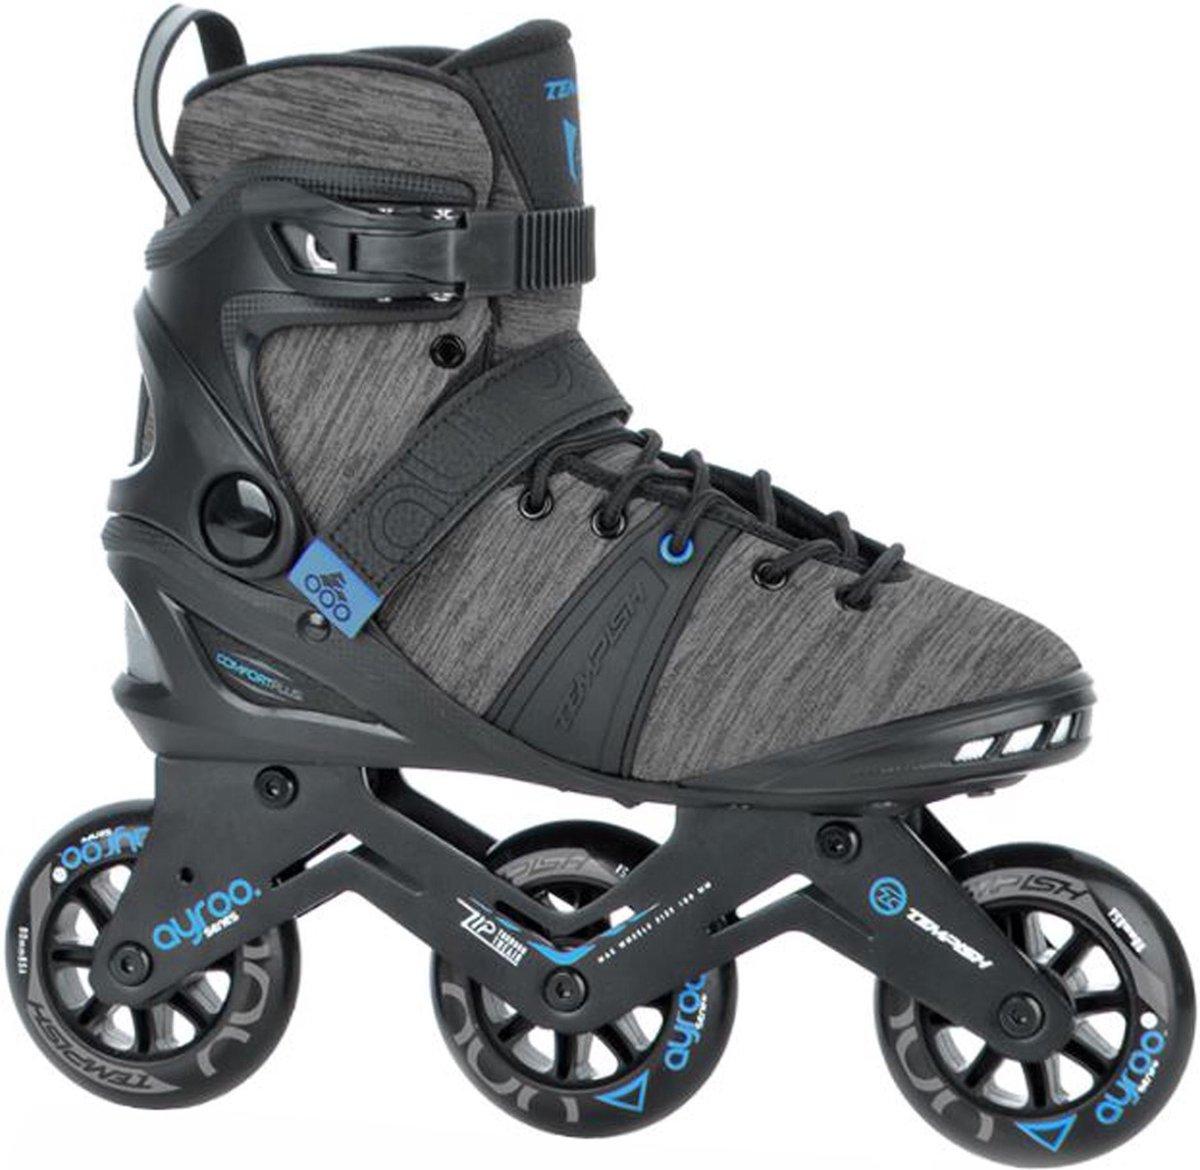 Tempish Ayroo 90 Inlineskates - Maat 43 - Unisex - zwart - grijs - blauw